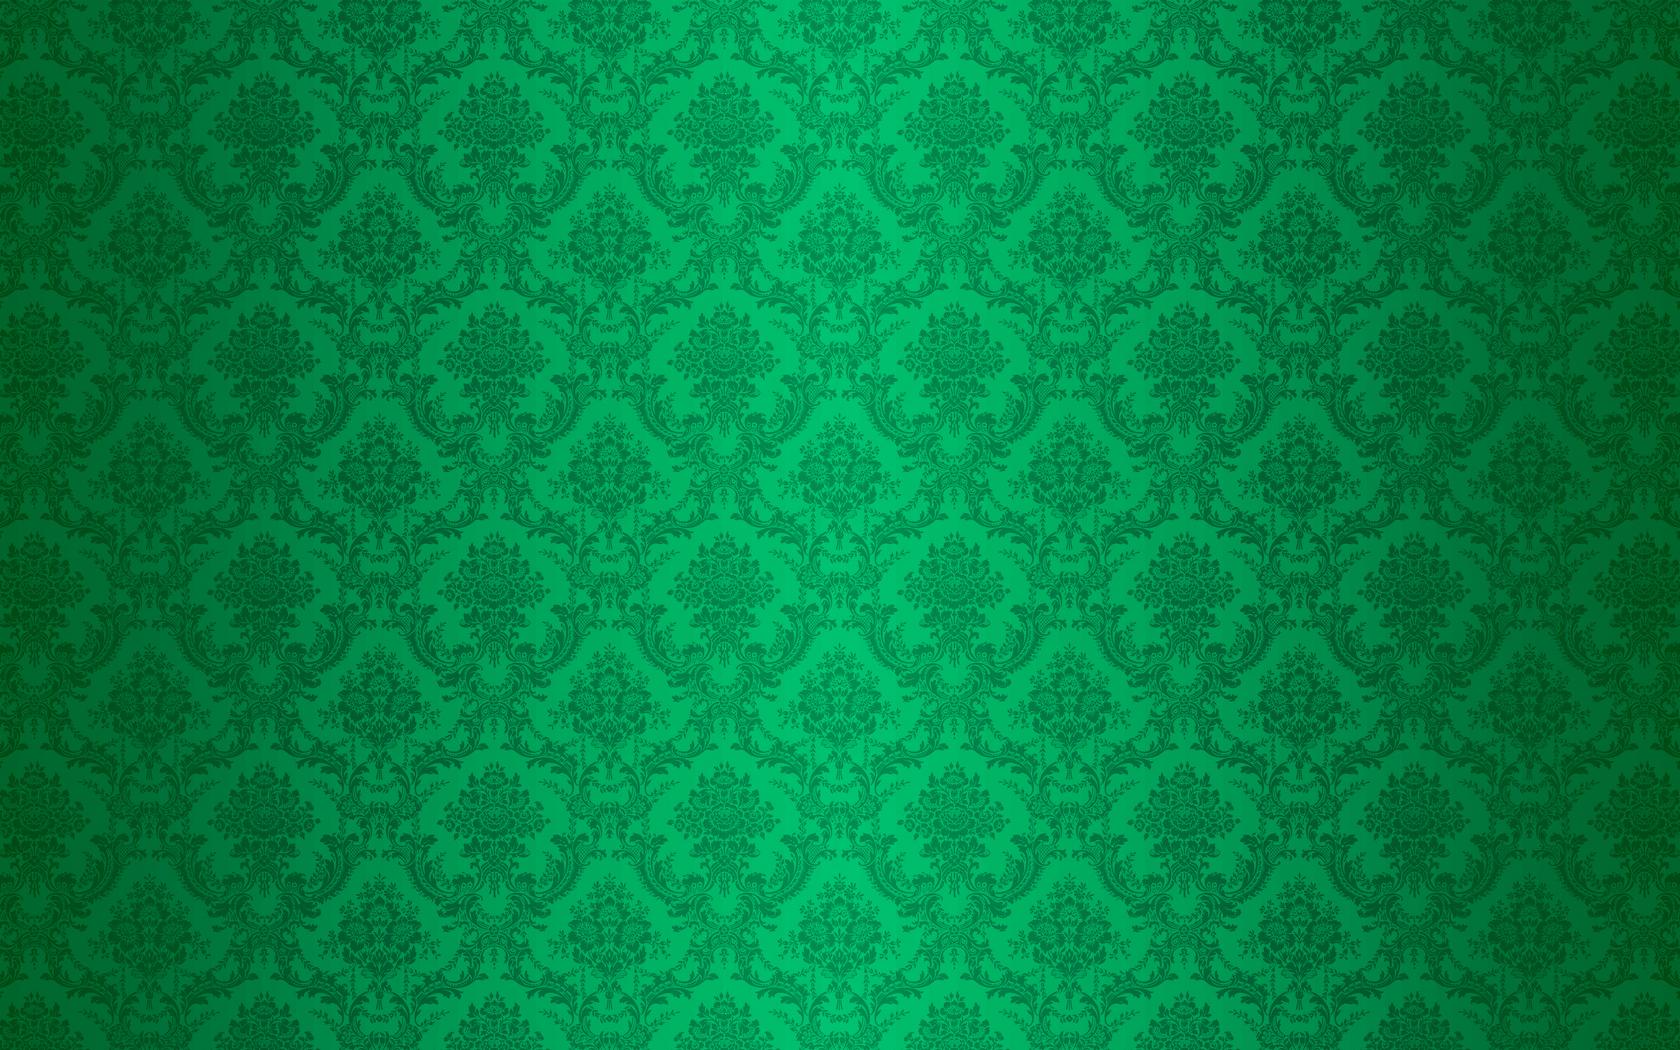 Flock Damask Wallpaper IV by flashingblade on deviantART 1680x1050